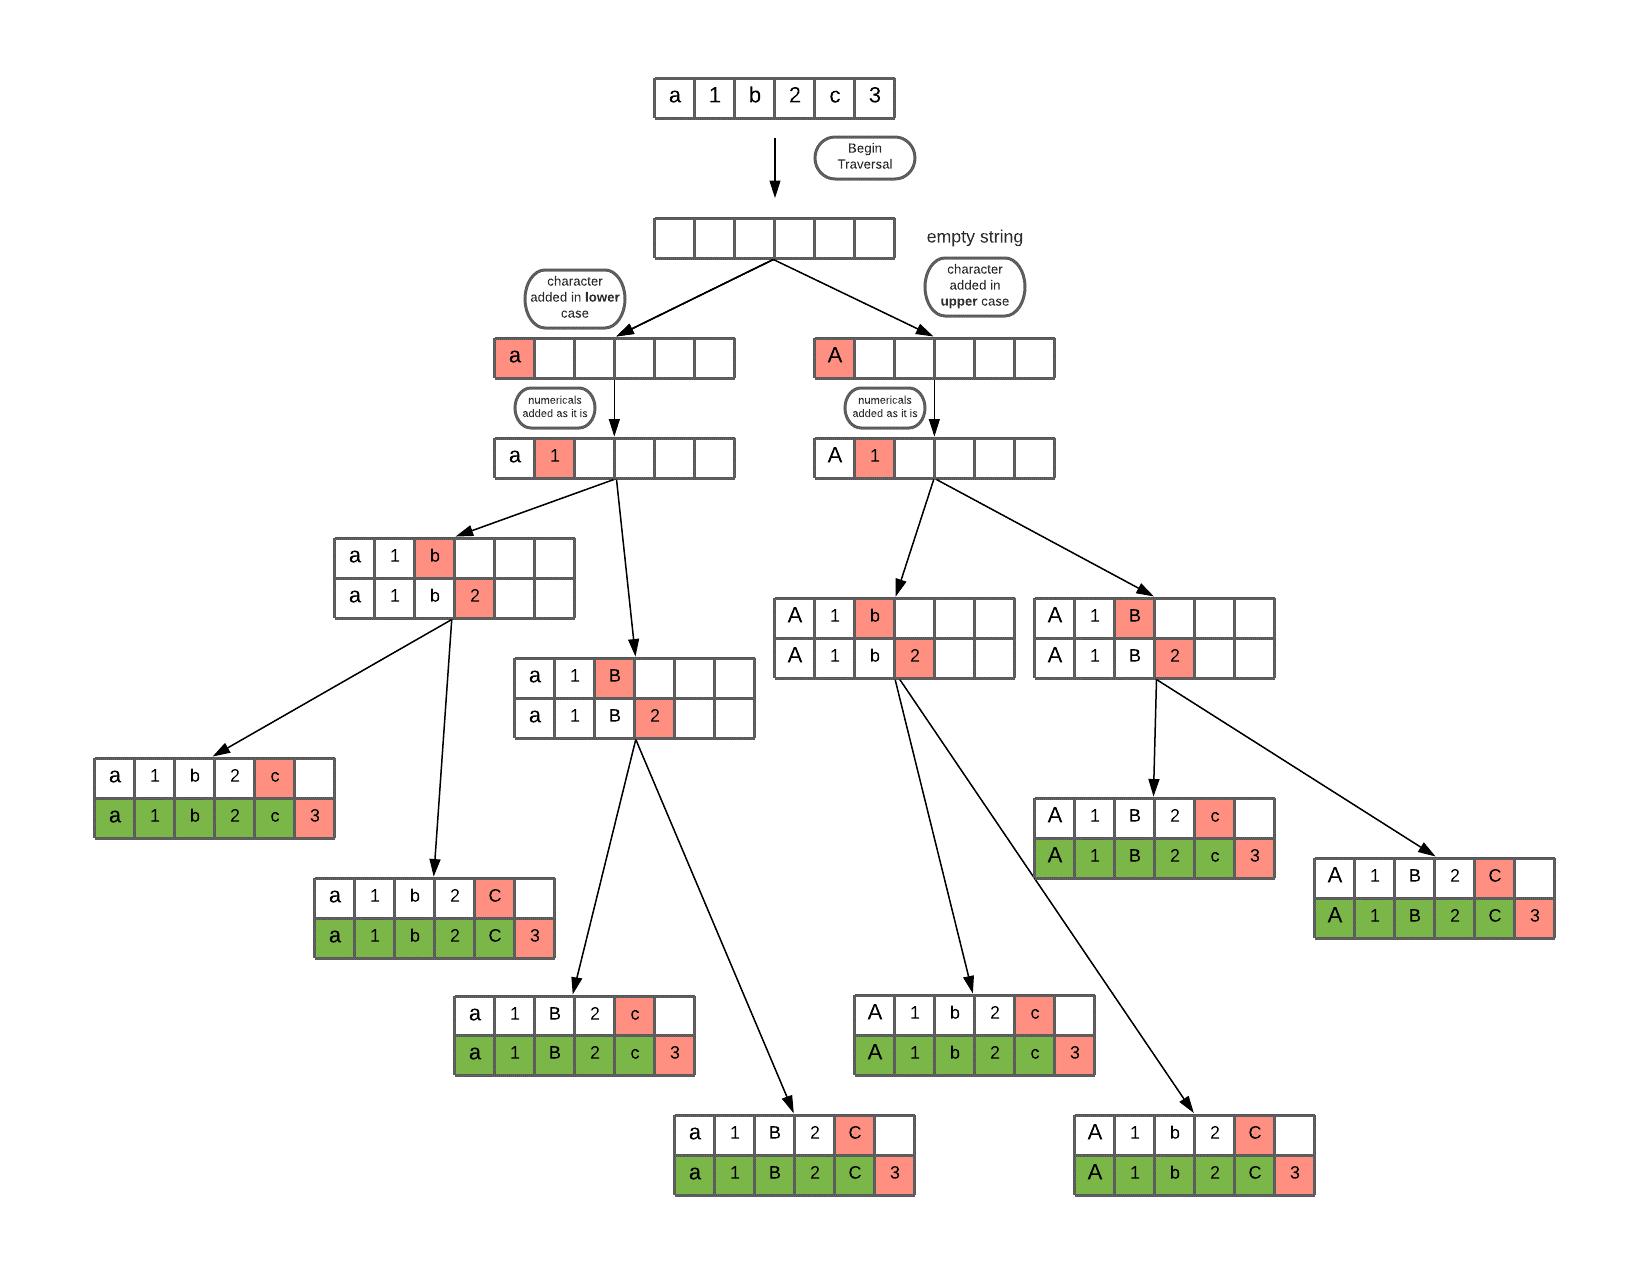 letter case permutation